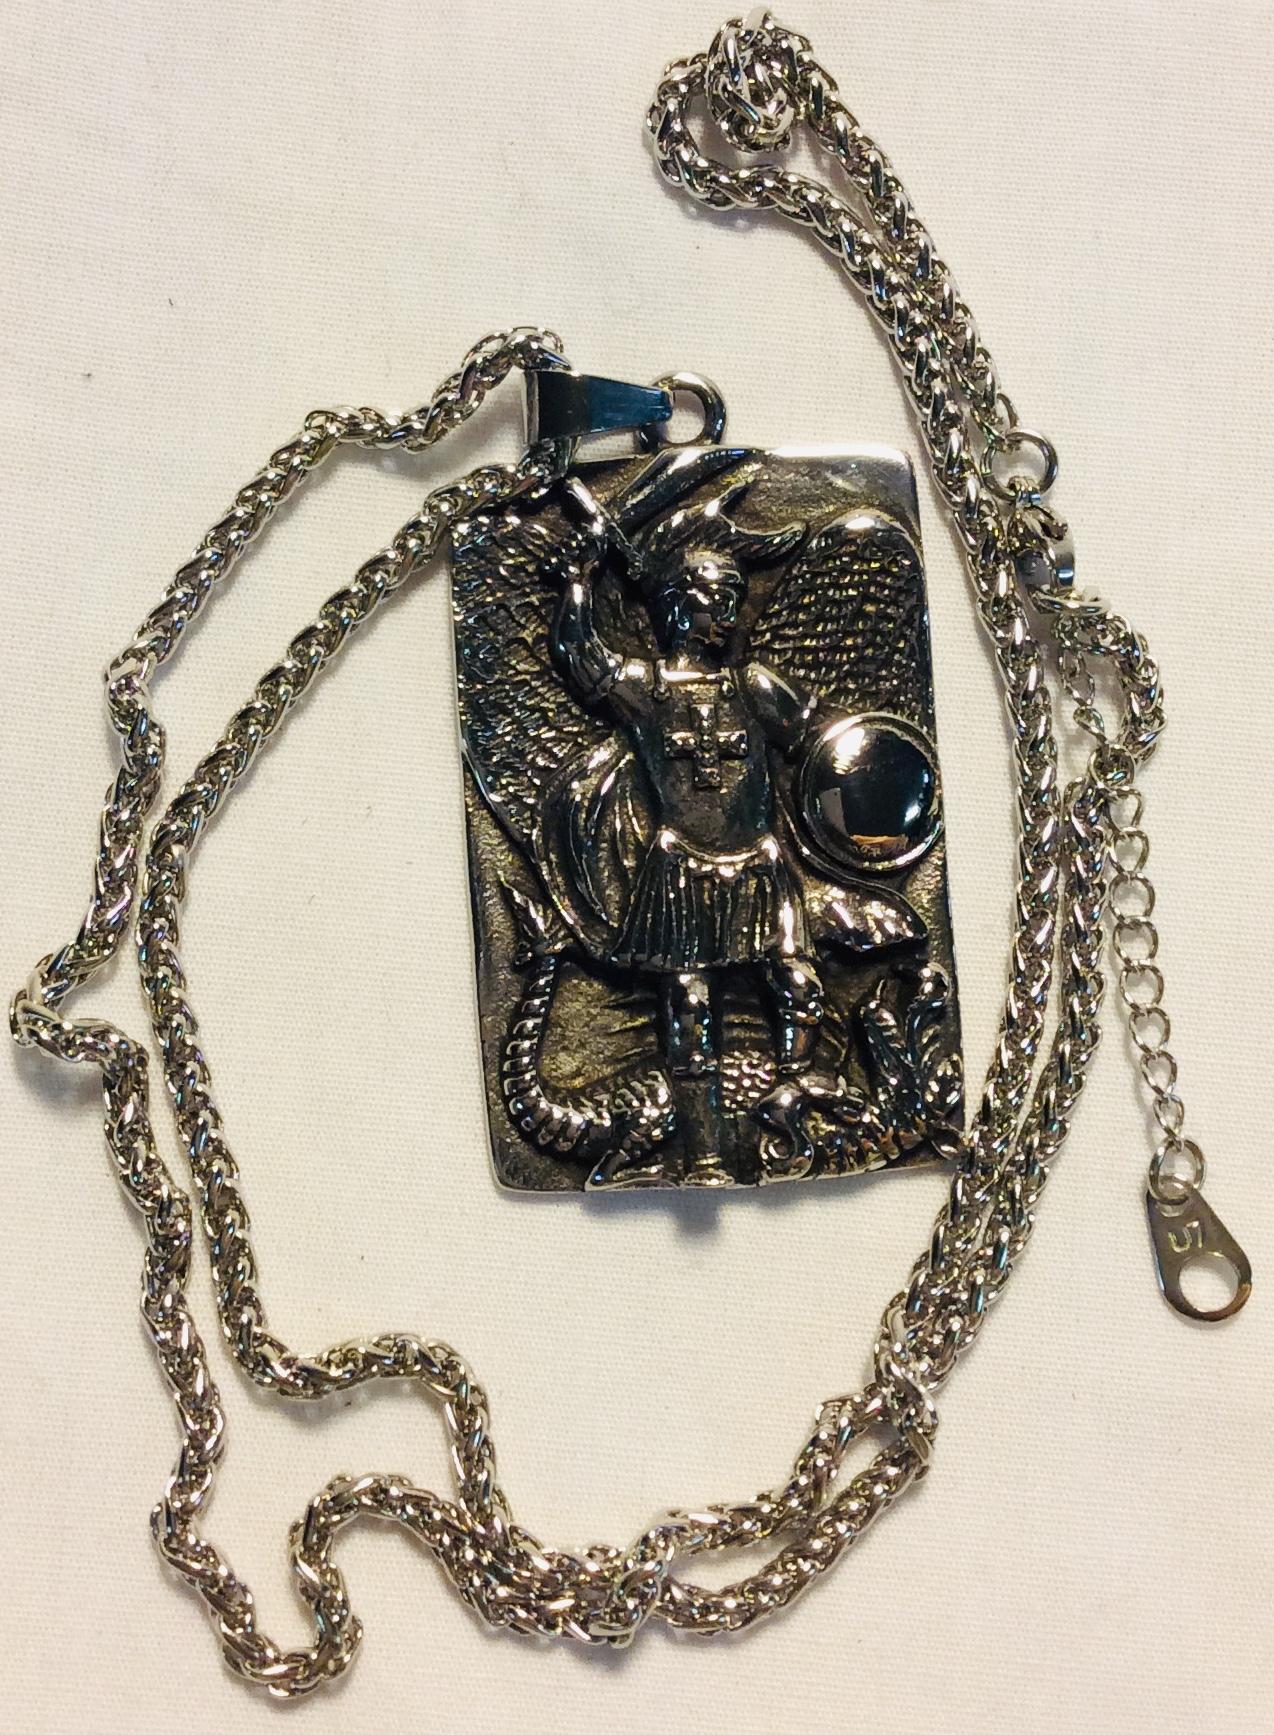 Large square metal pendant